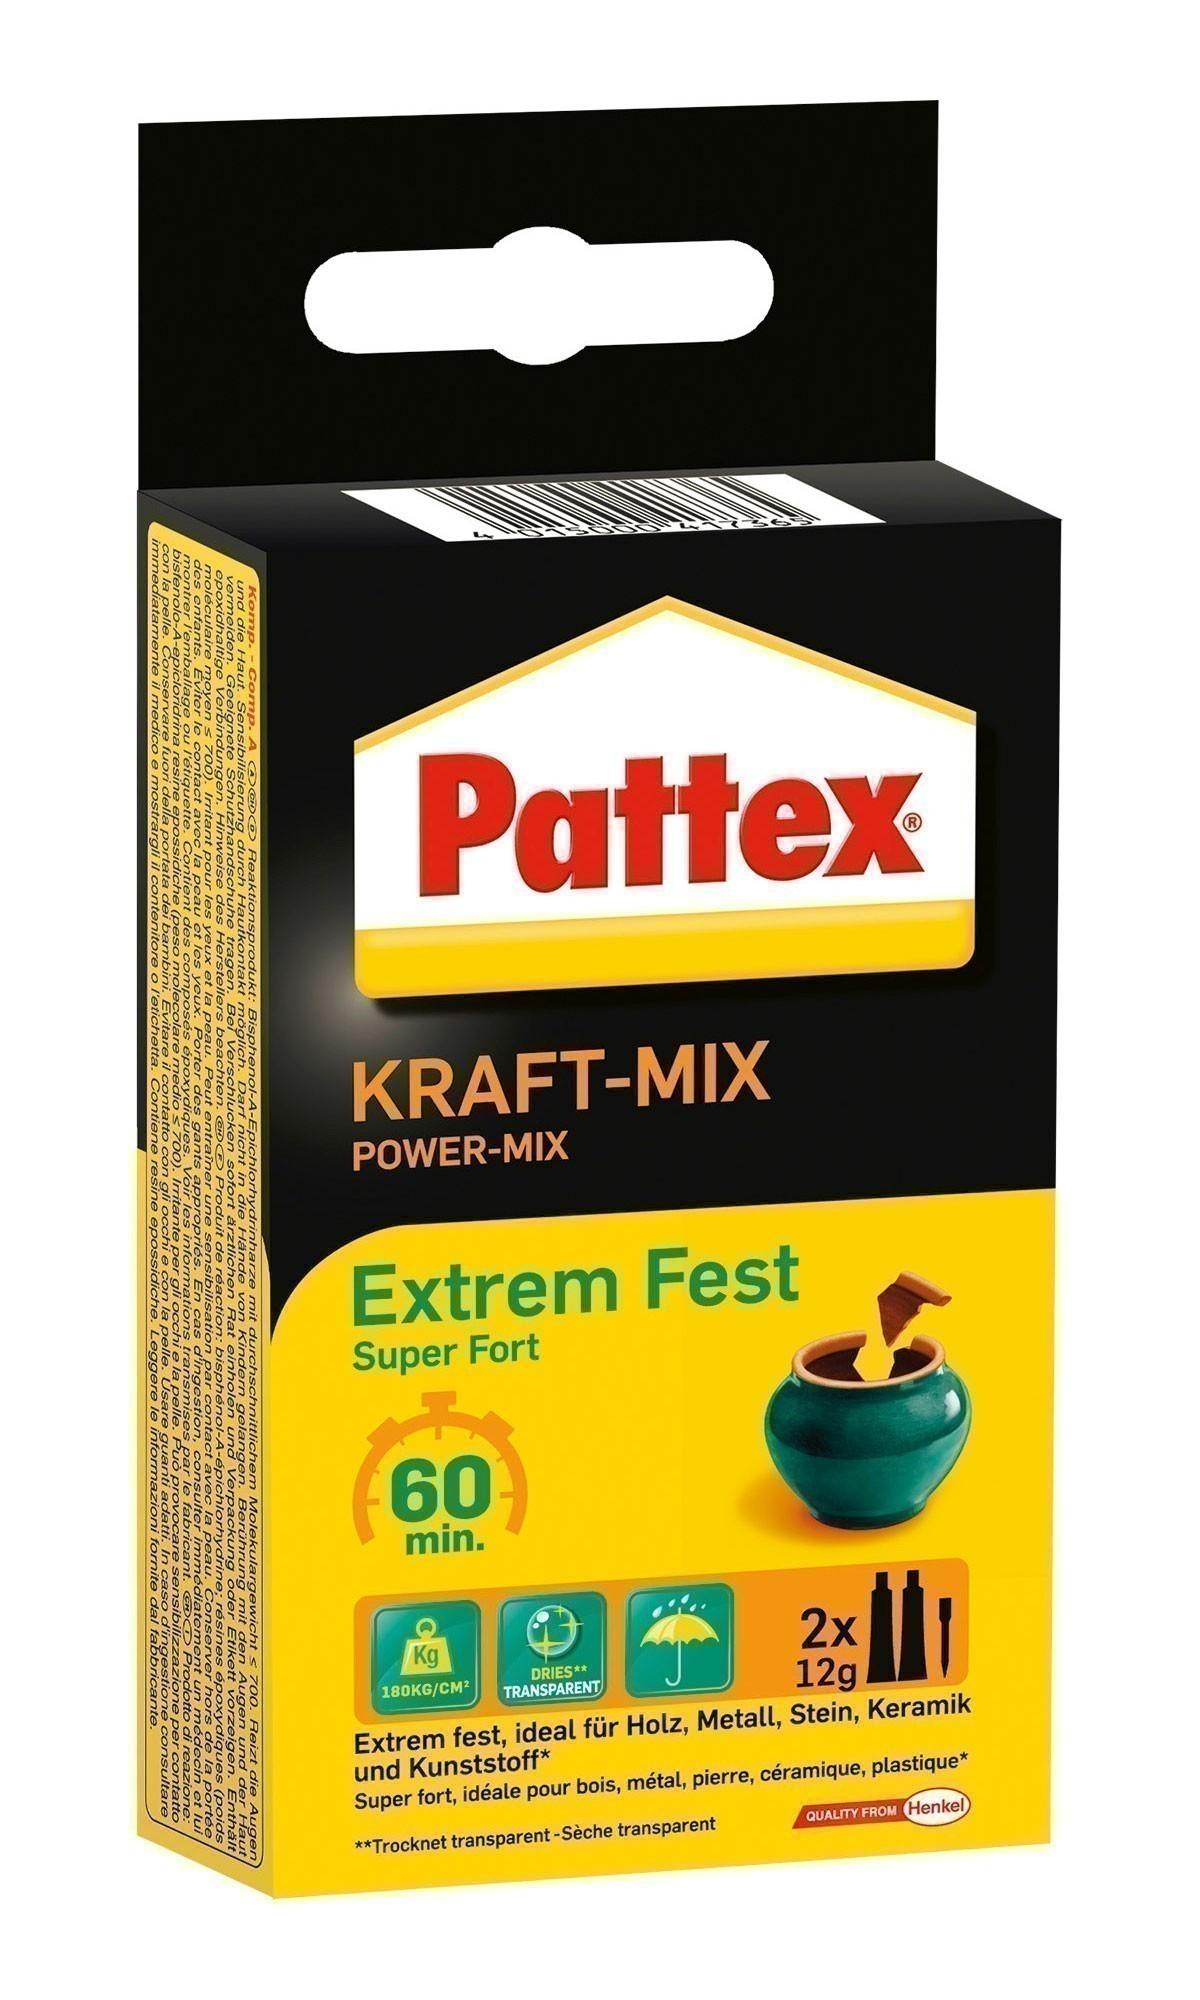 Pattex Power Kleber / 2Komponenten-Kleber Kraft-Mix Extrem Fest 2x11ml Bild 1